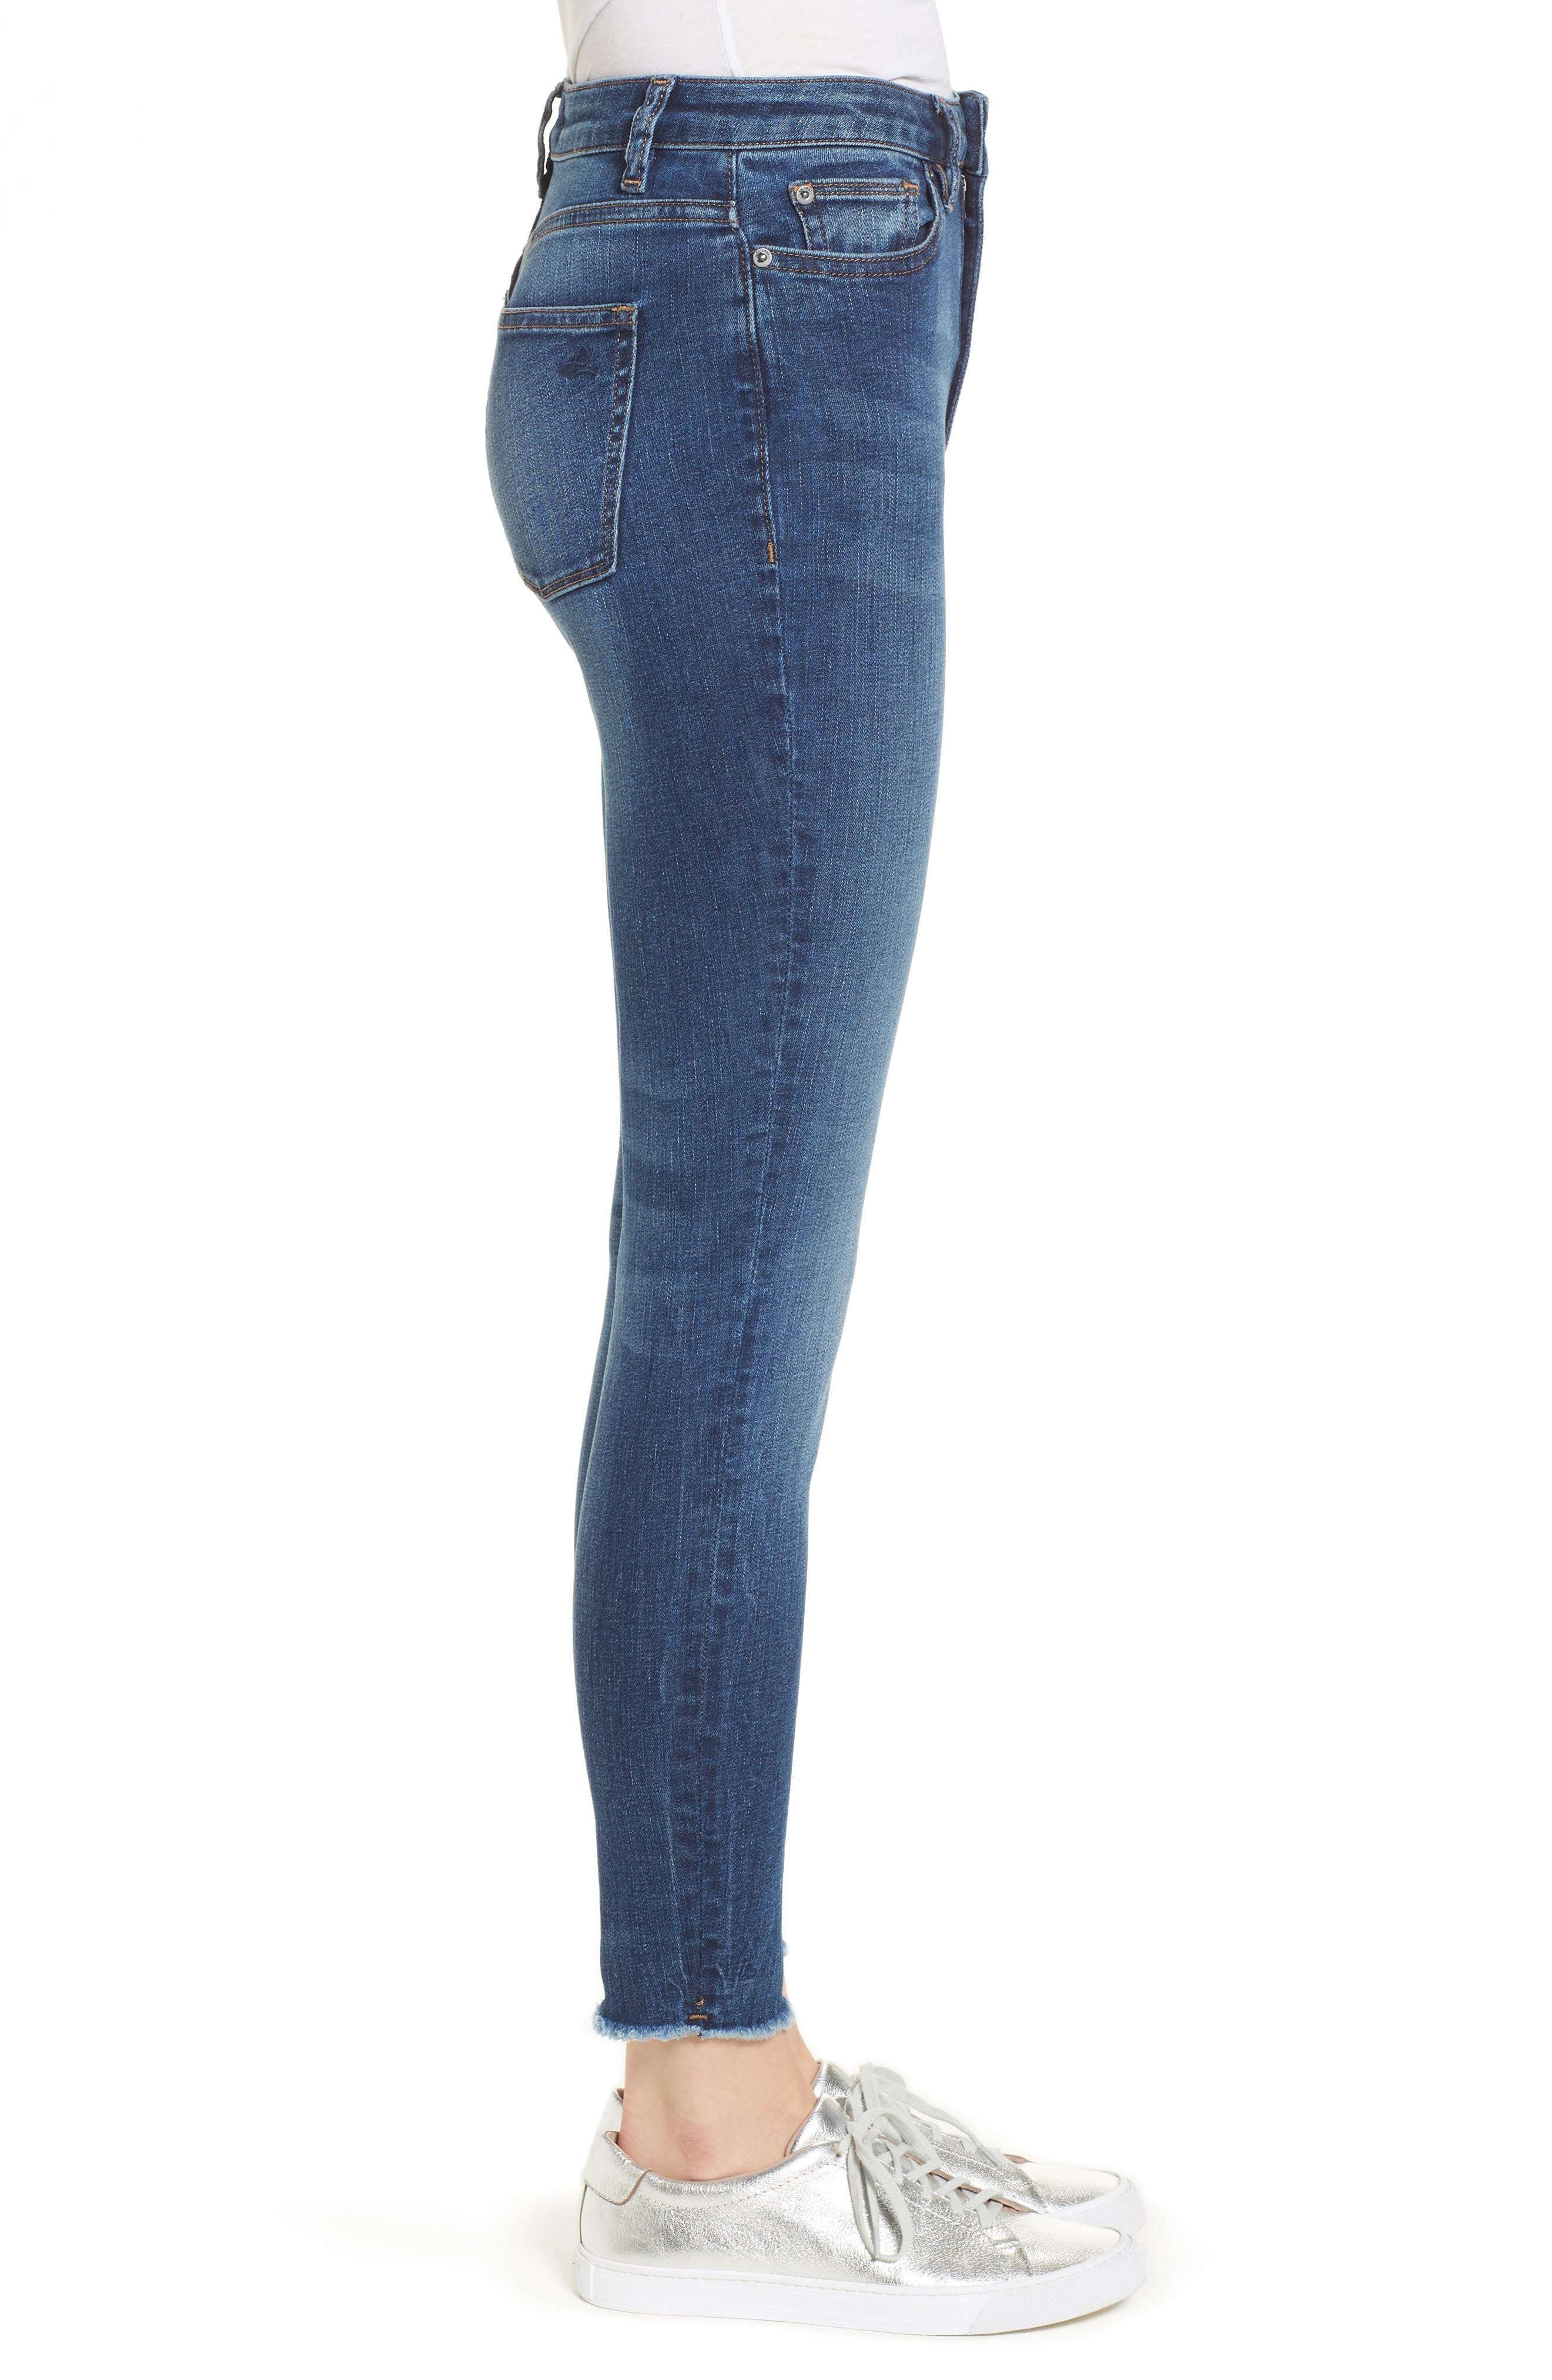 Chrissy Trimtone High Waist Skinny Jeans,                             Alternate thumbnail 3, color,                             Bal Harbour